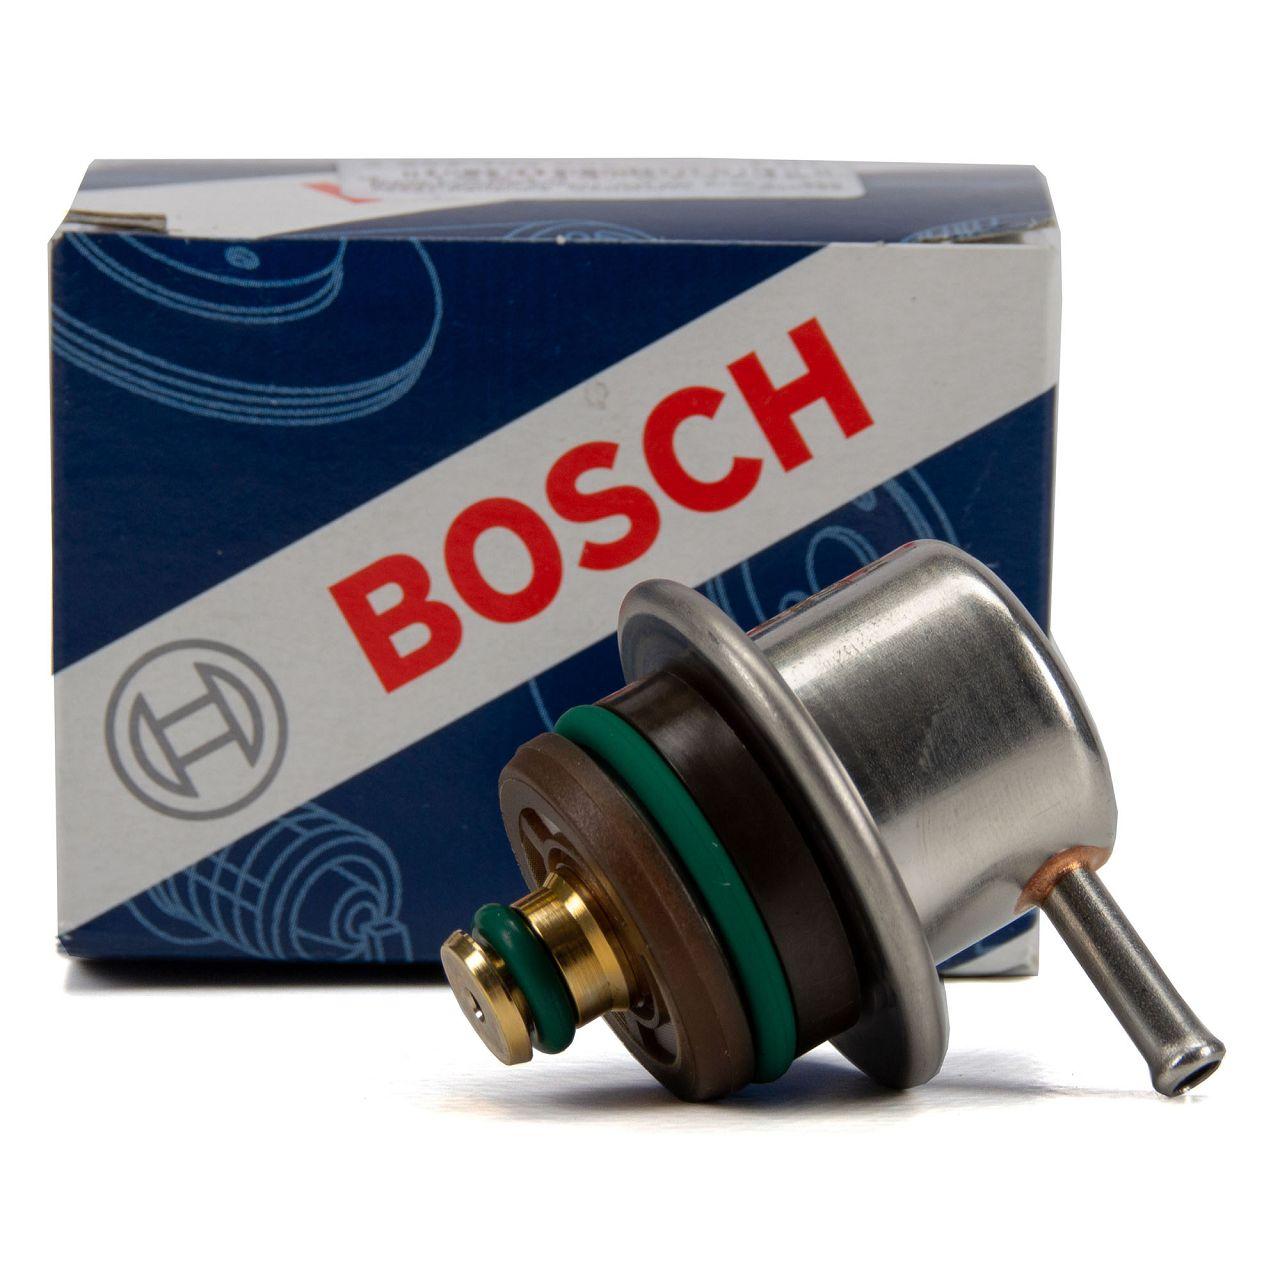 BOSCH 0280160557 Kraftstoffdruckregler AUDI A3 8L SEAT SKODA VW Golf 3 4 5 Polo